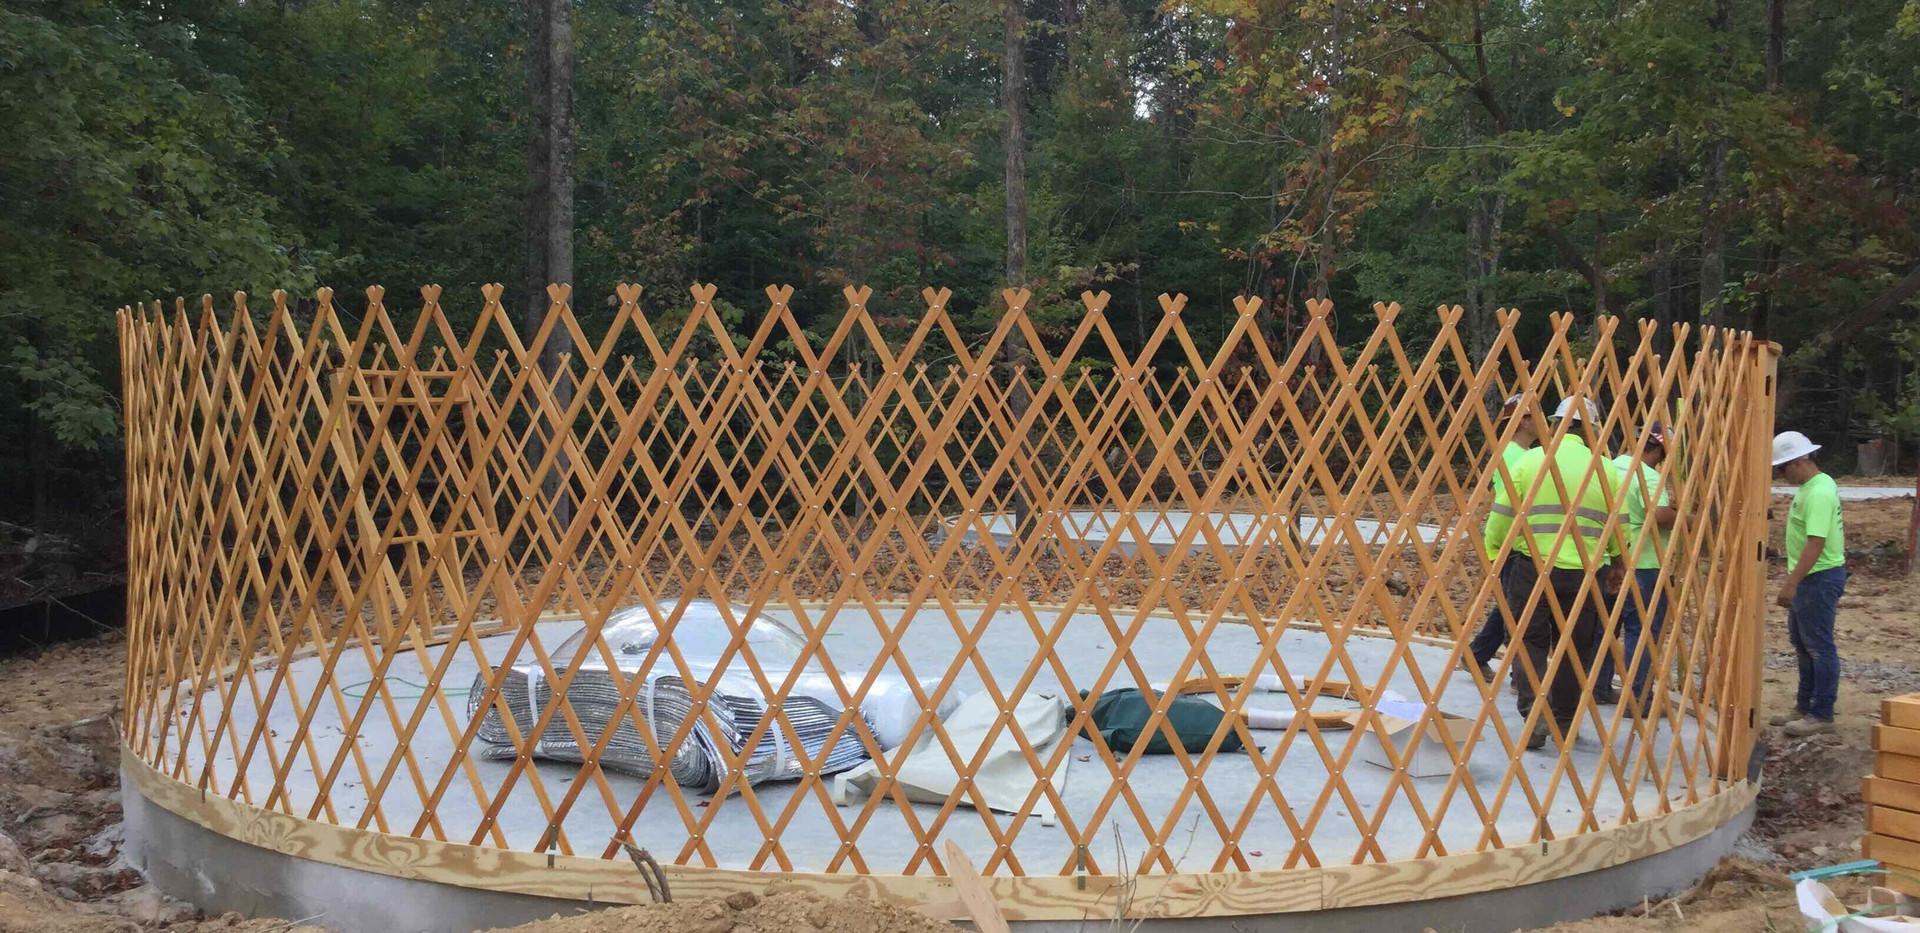 Yurt Construction - View 1